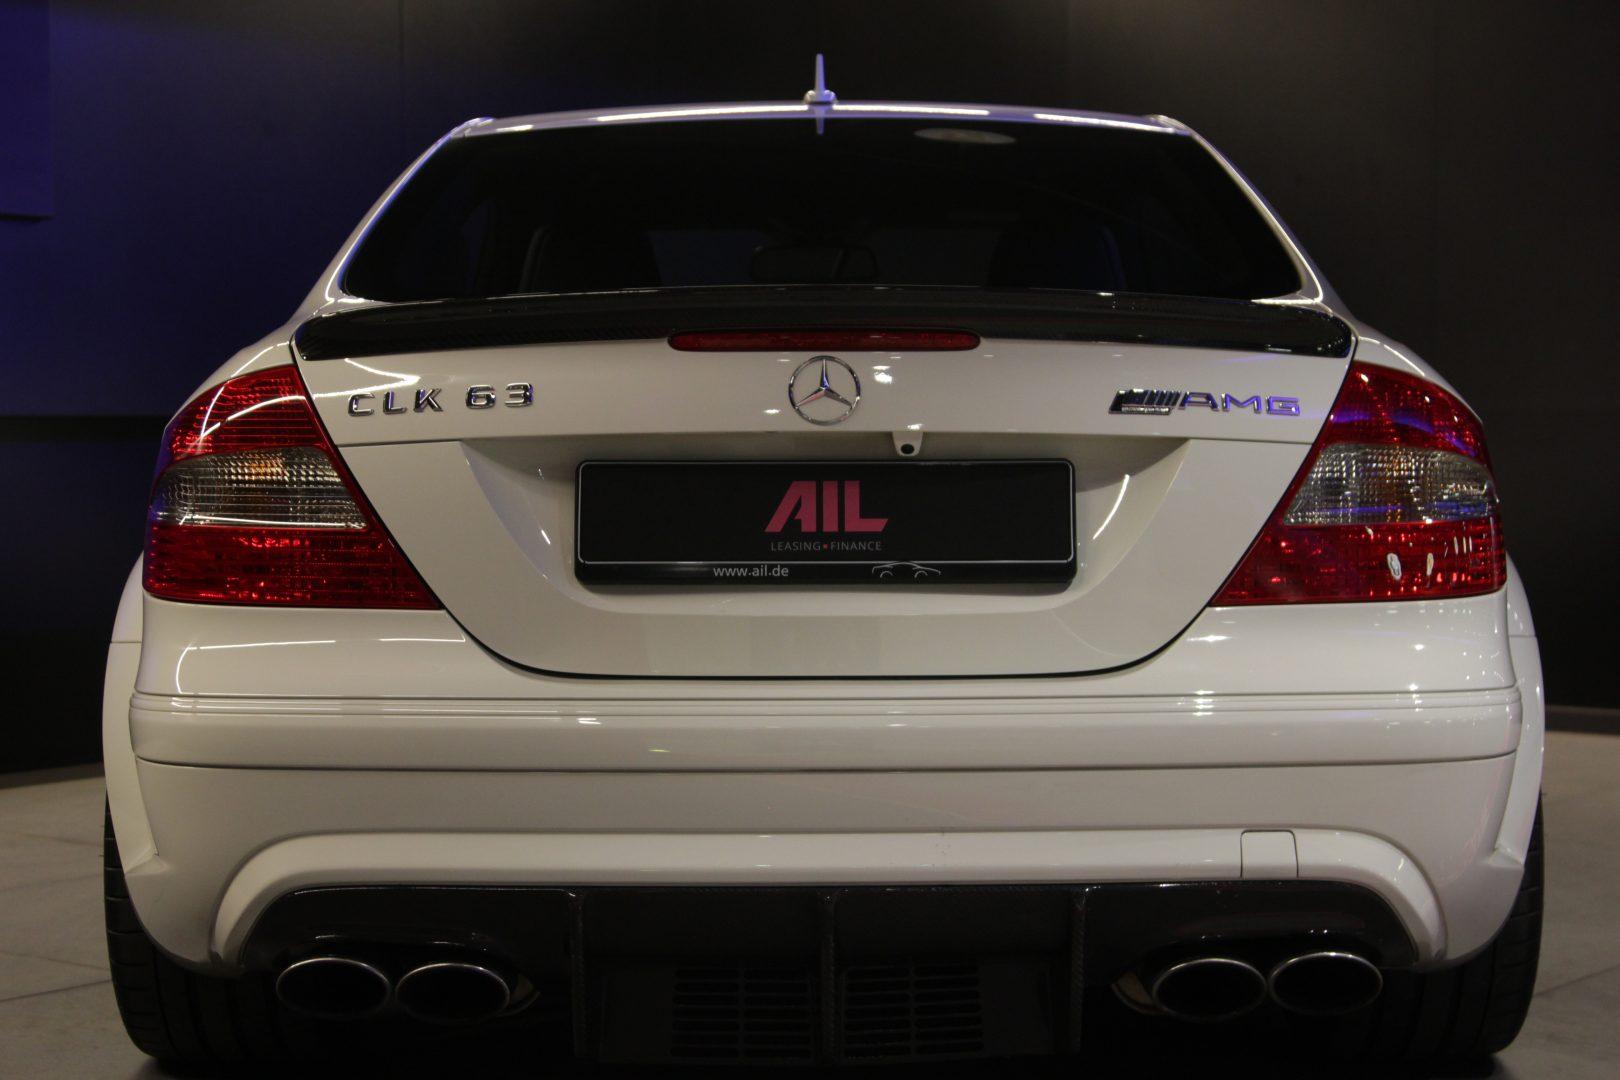 AIL Mercedes-Benz CLK 63 AMG Black Series 1